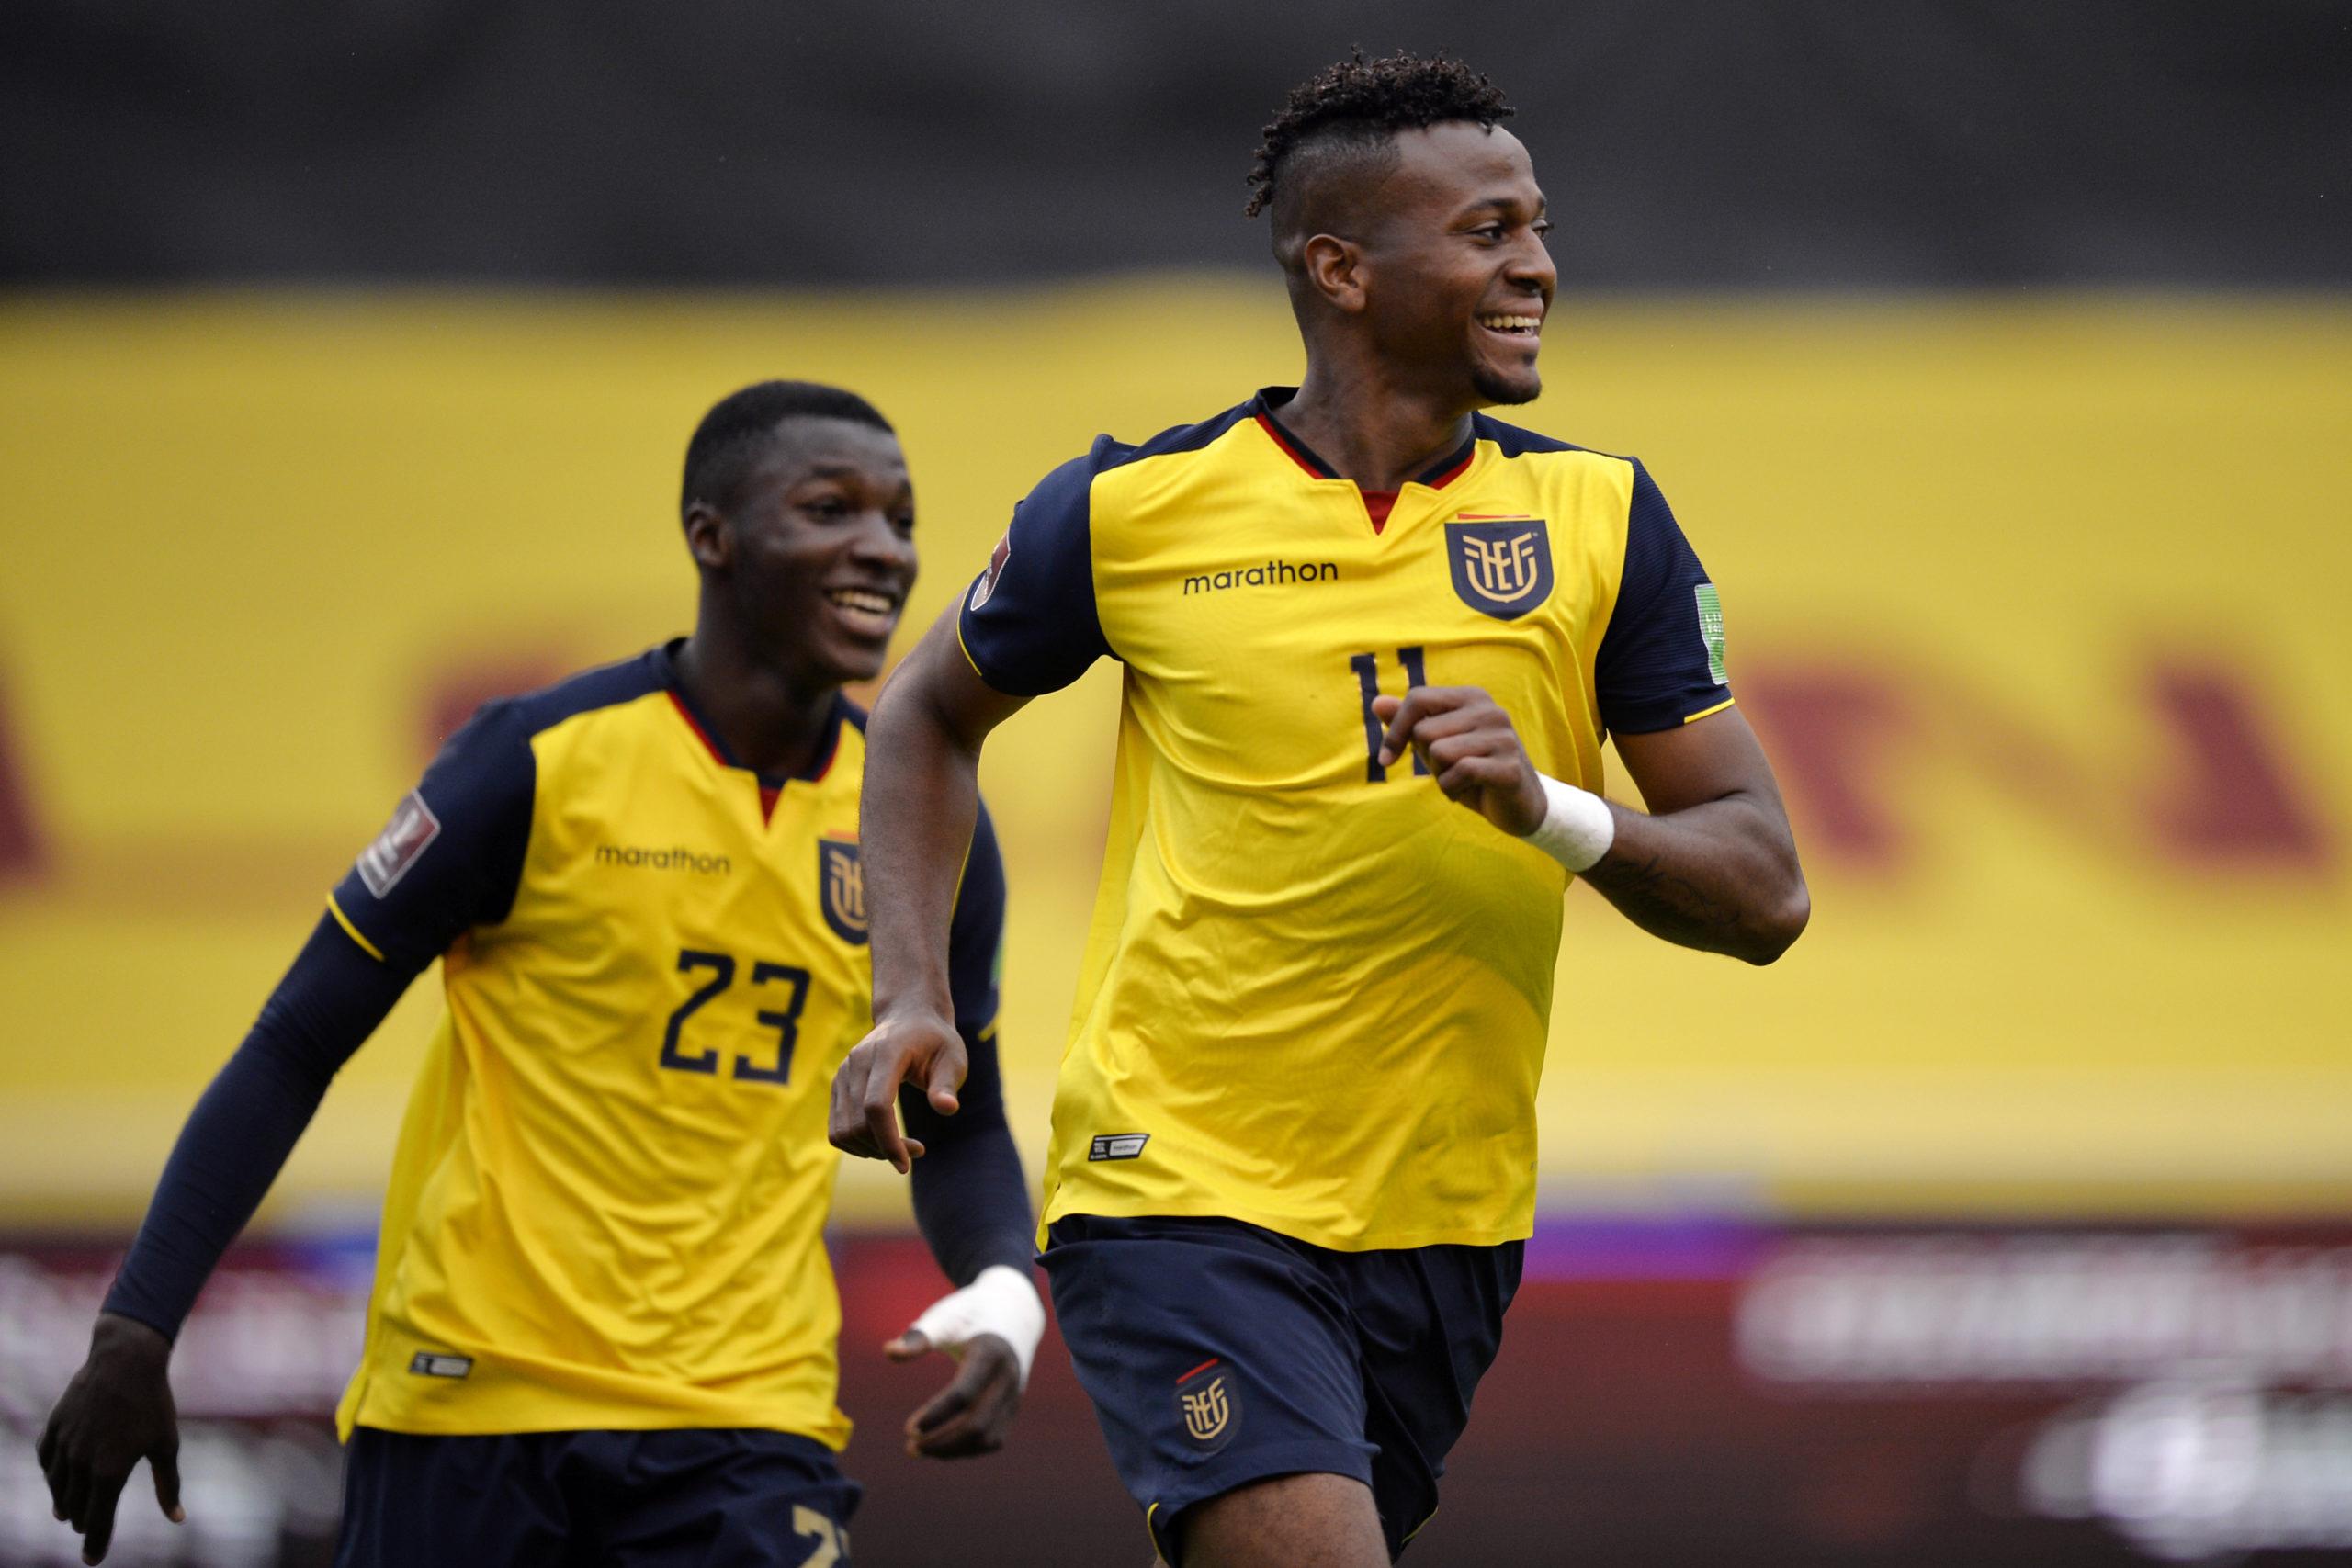 Ecuador v Colombia - South American Qualifiers for Qatar 2022